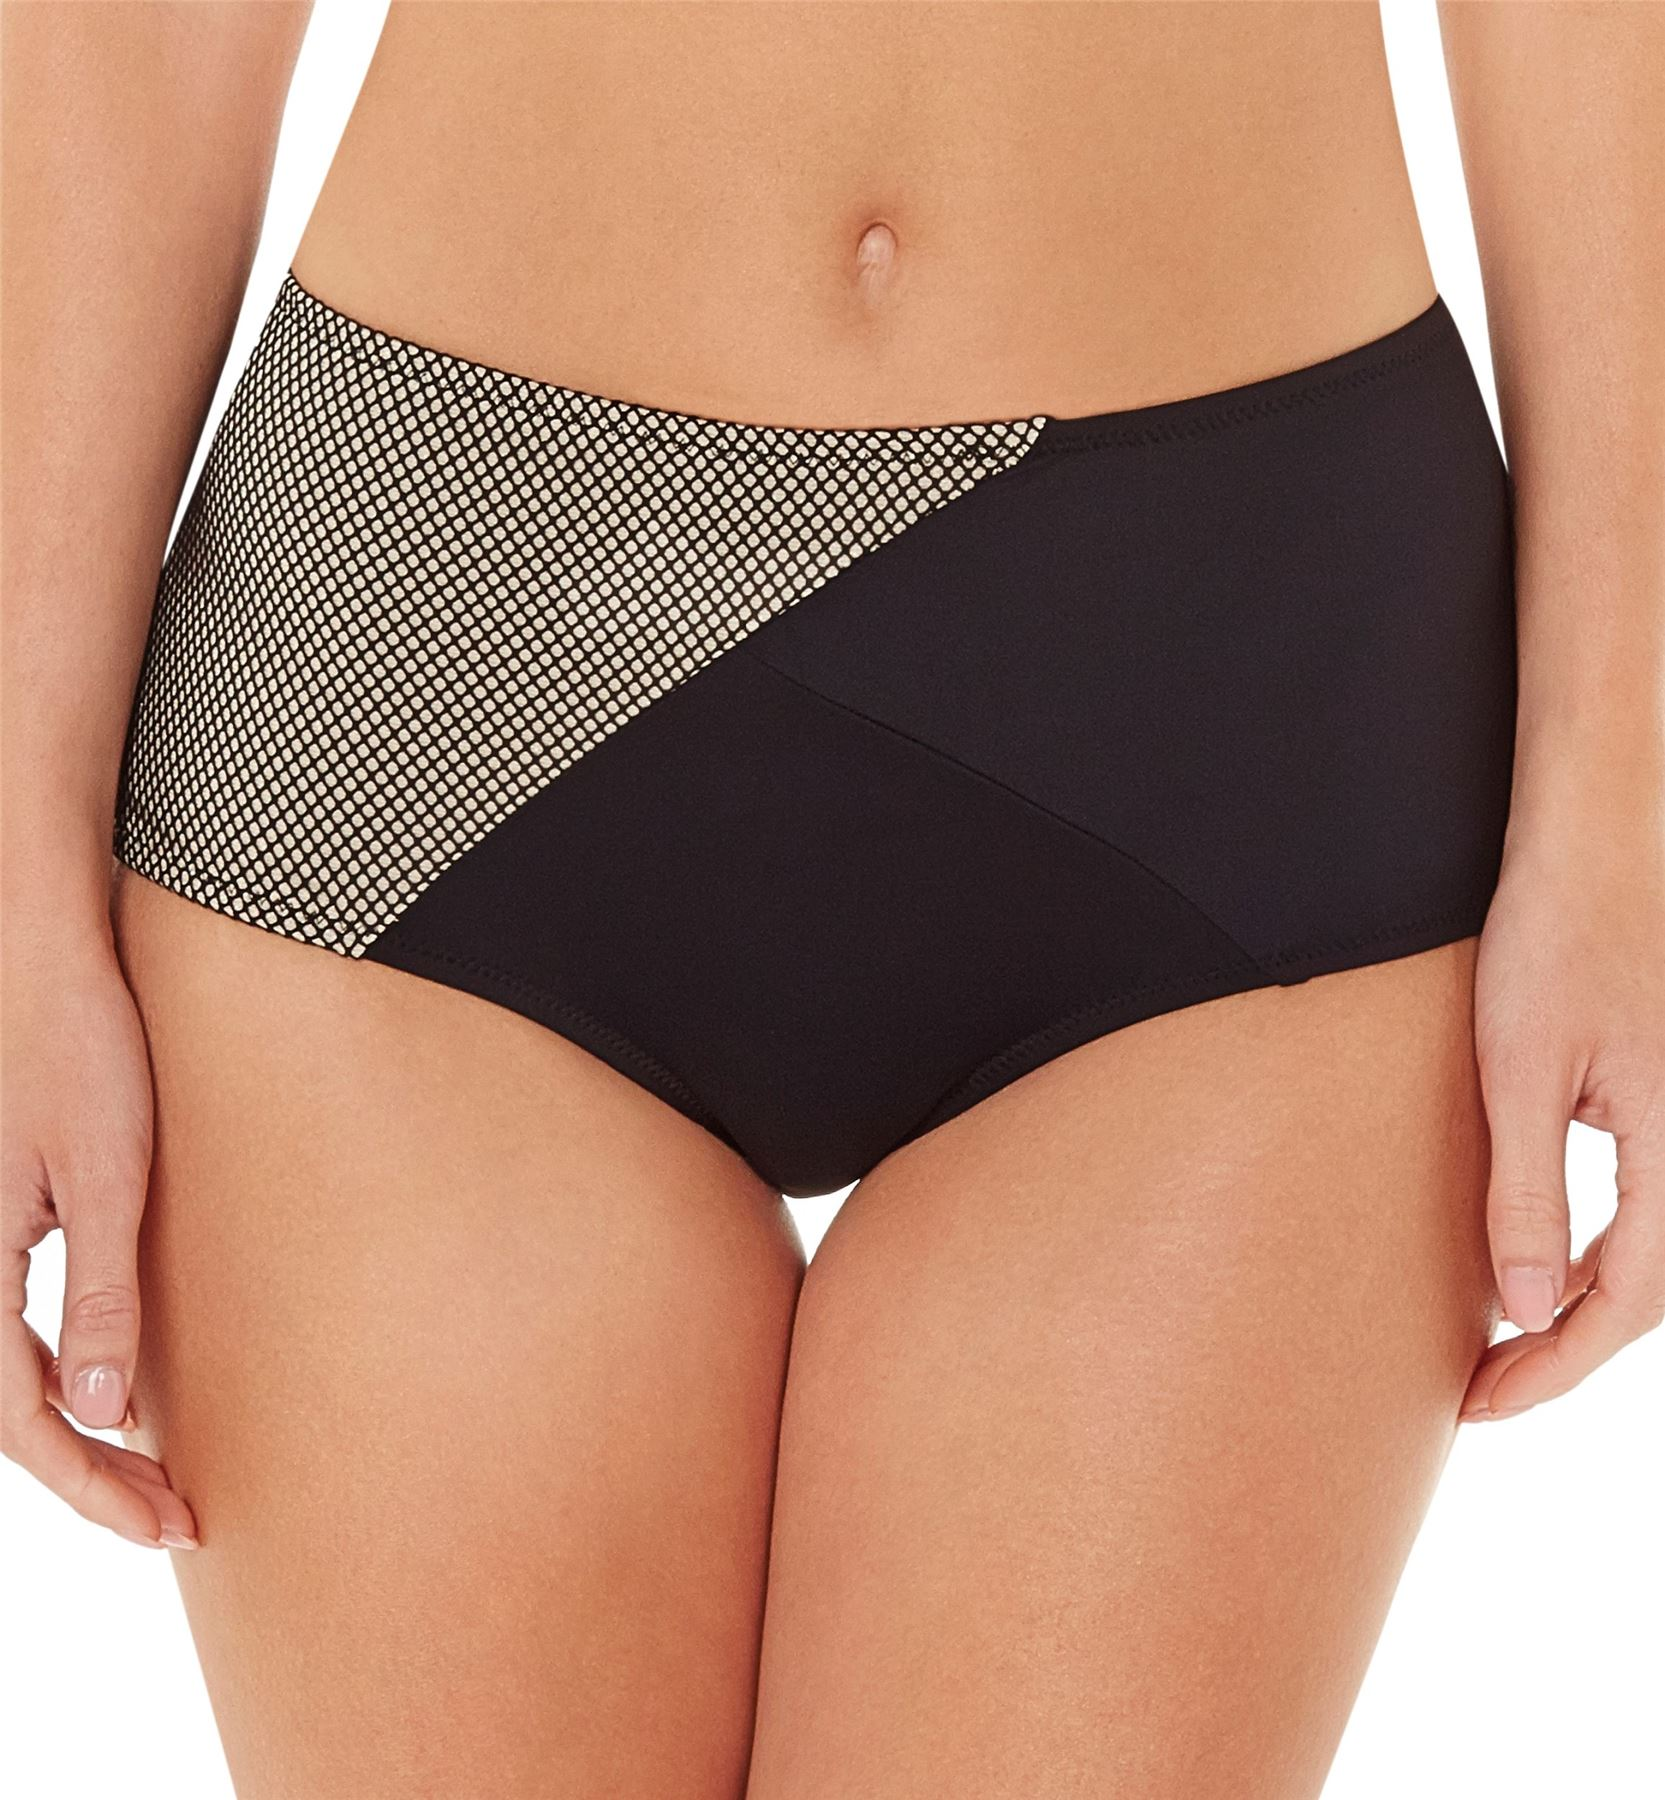 bikini hohe hose asos mix and match contrast high waist. Black Bedroom Furniture Sets. Home Design Ideas